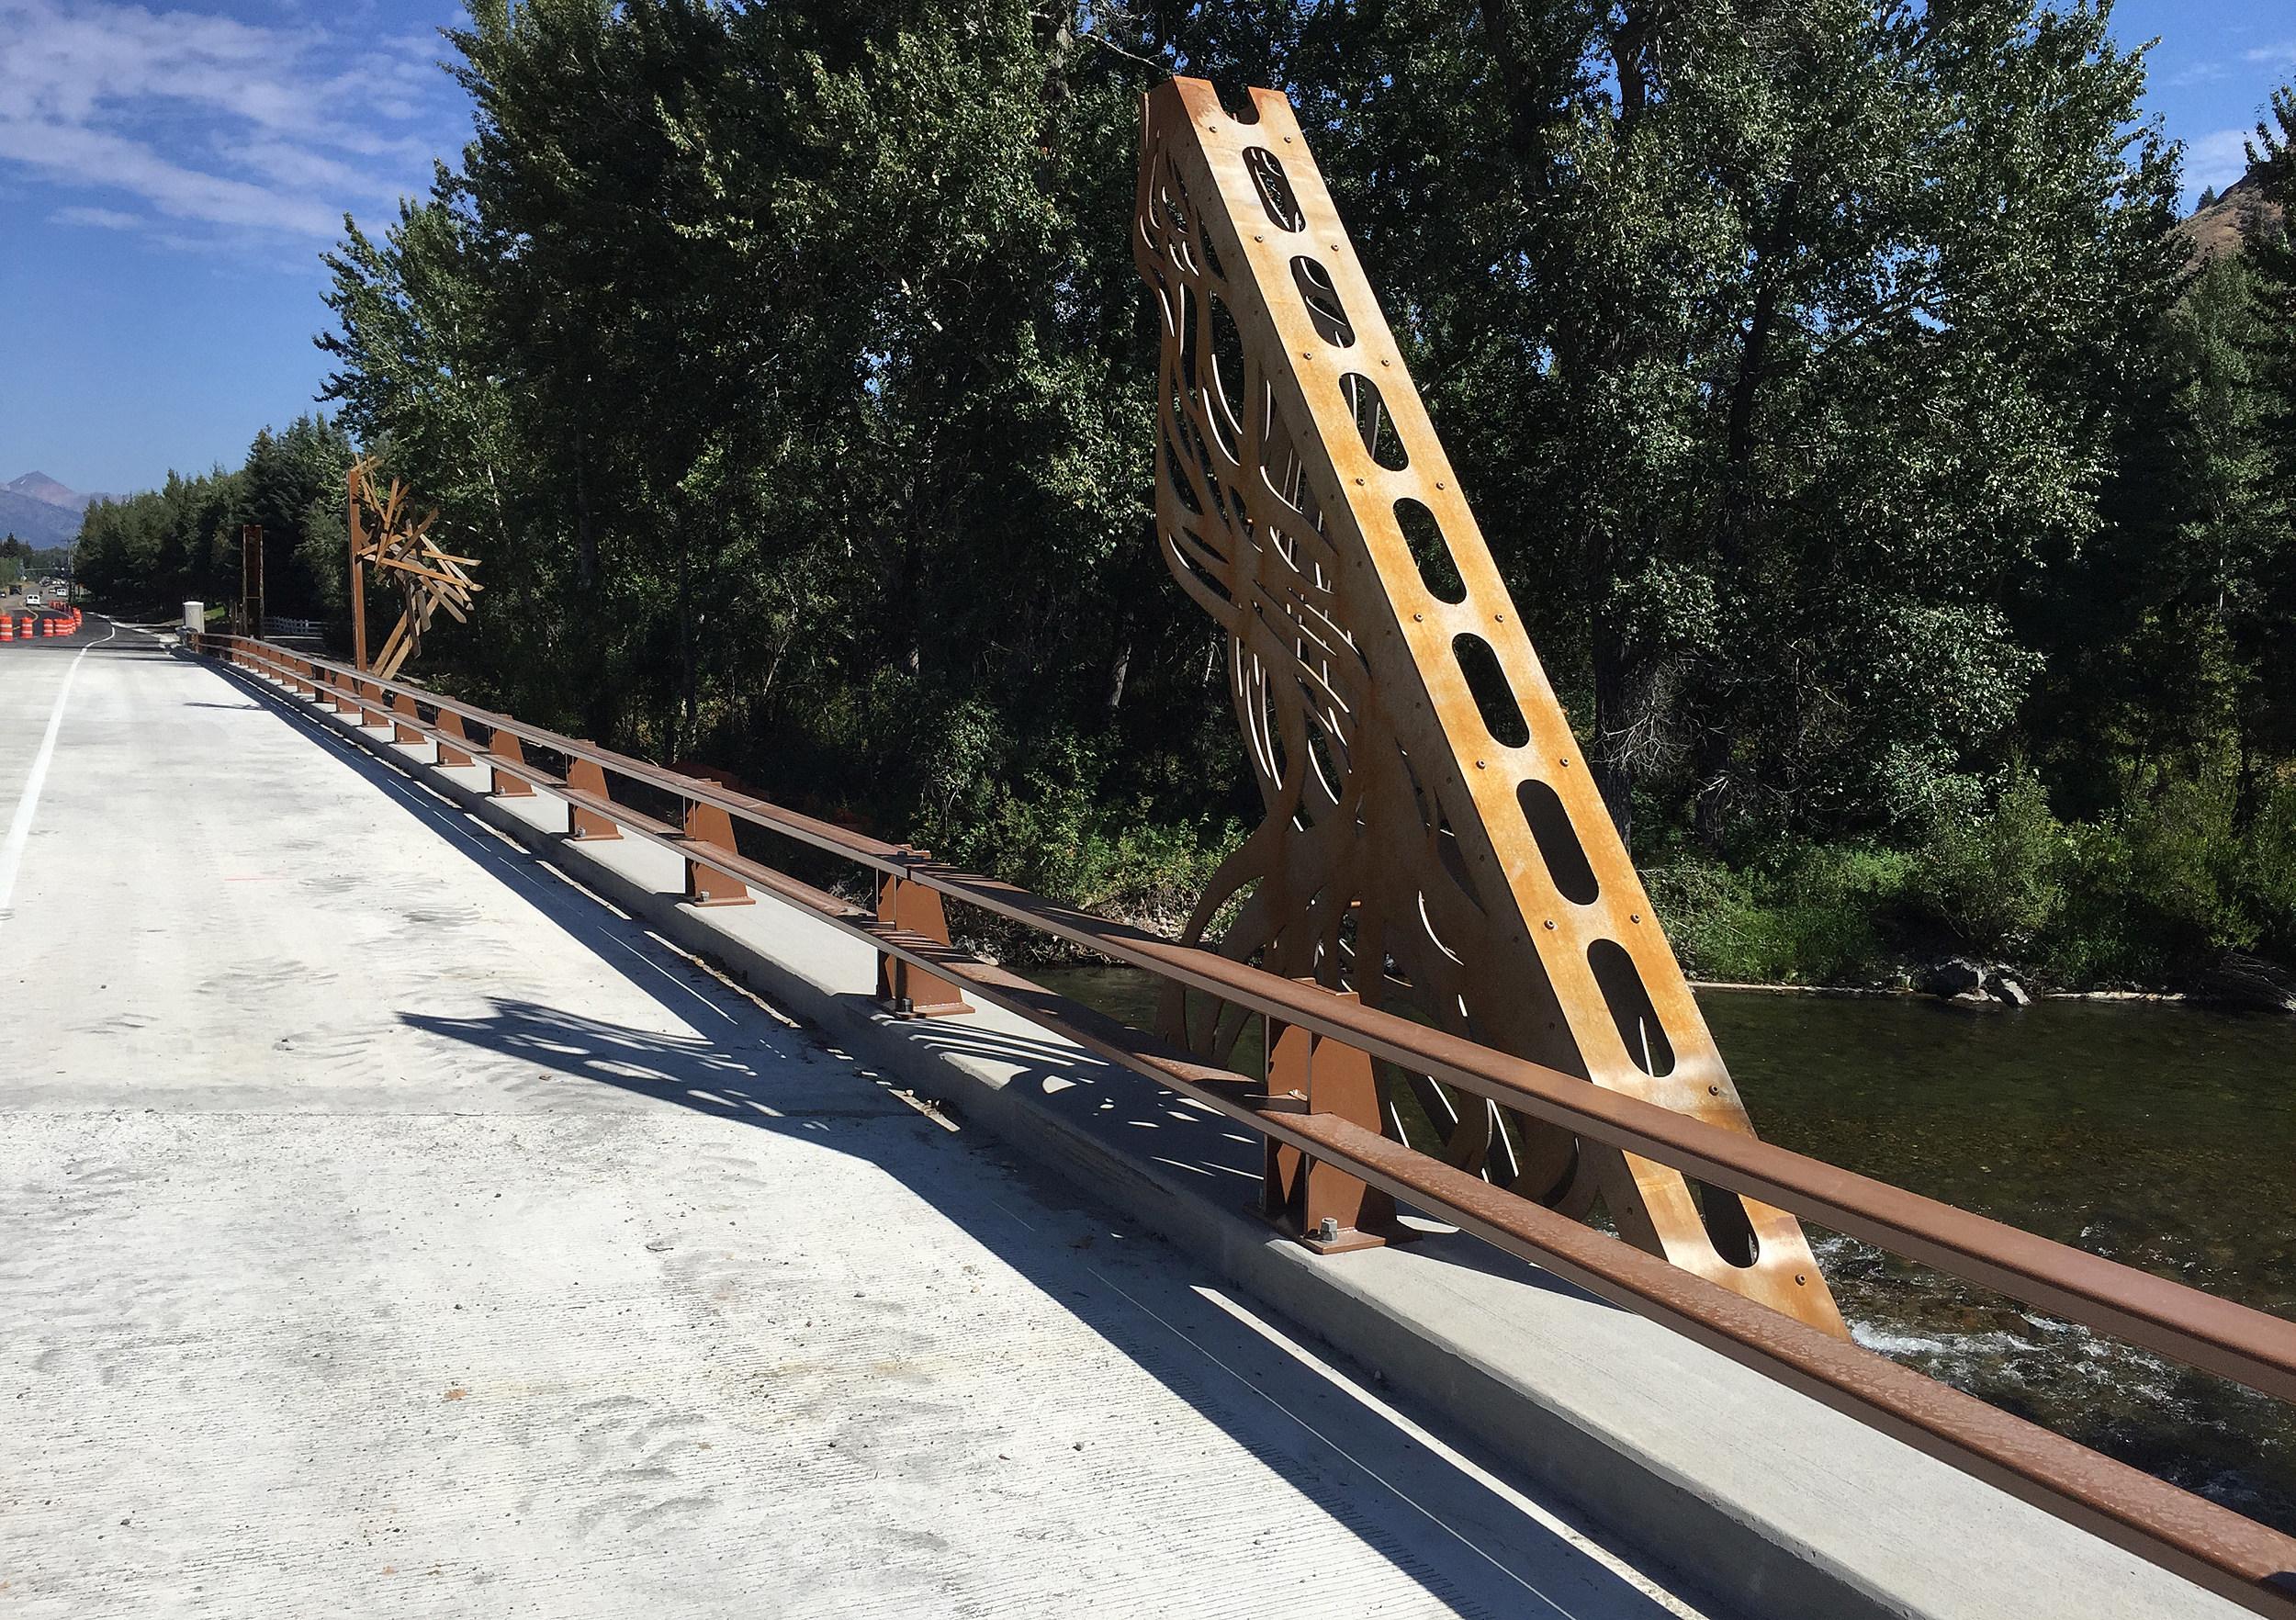 Photo courtesy of Idaho Transportation Department